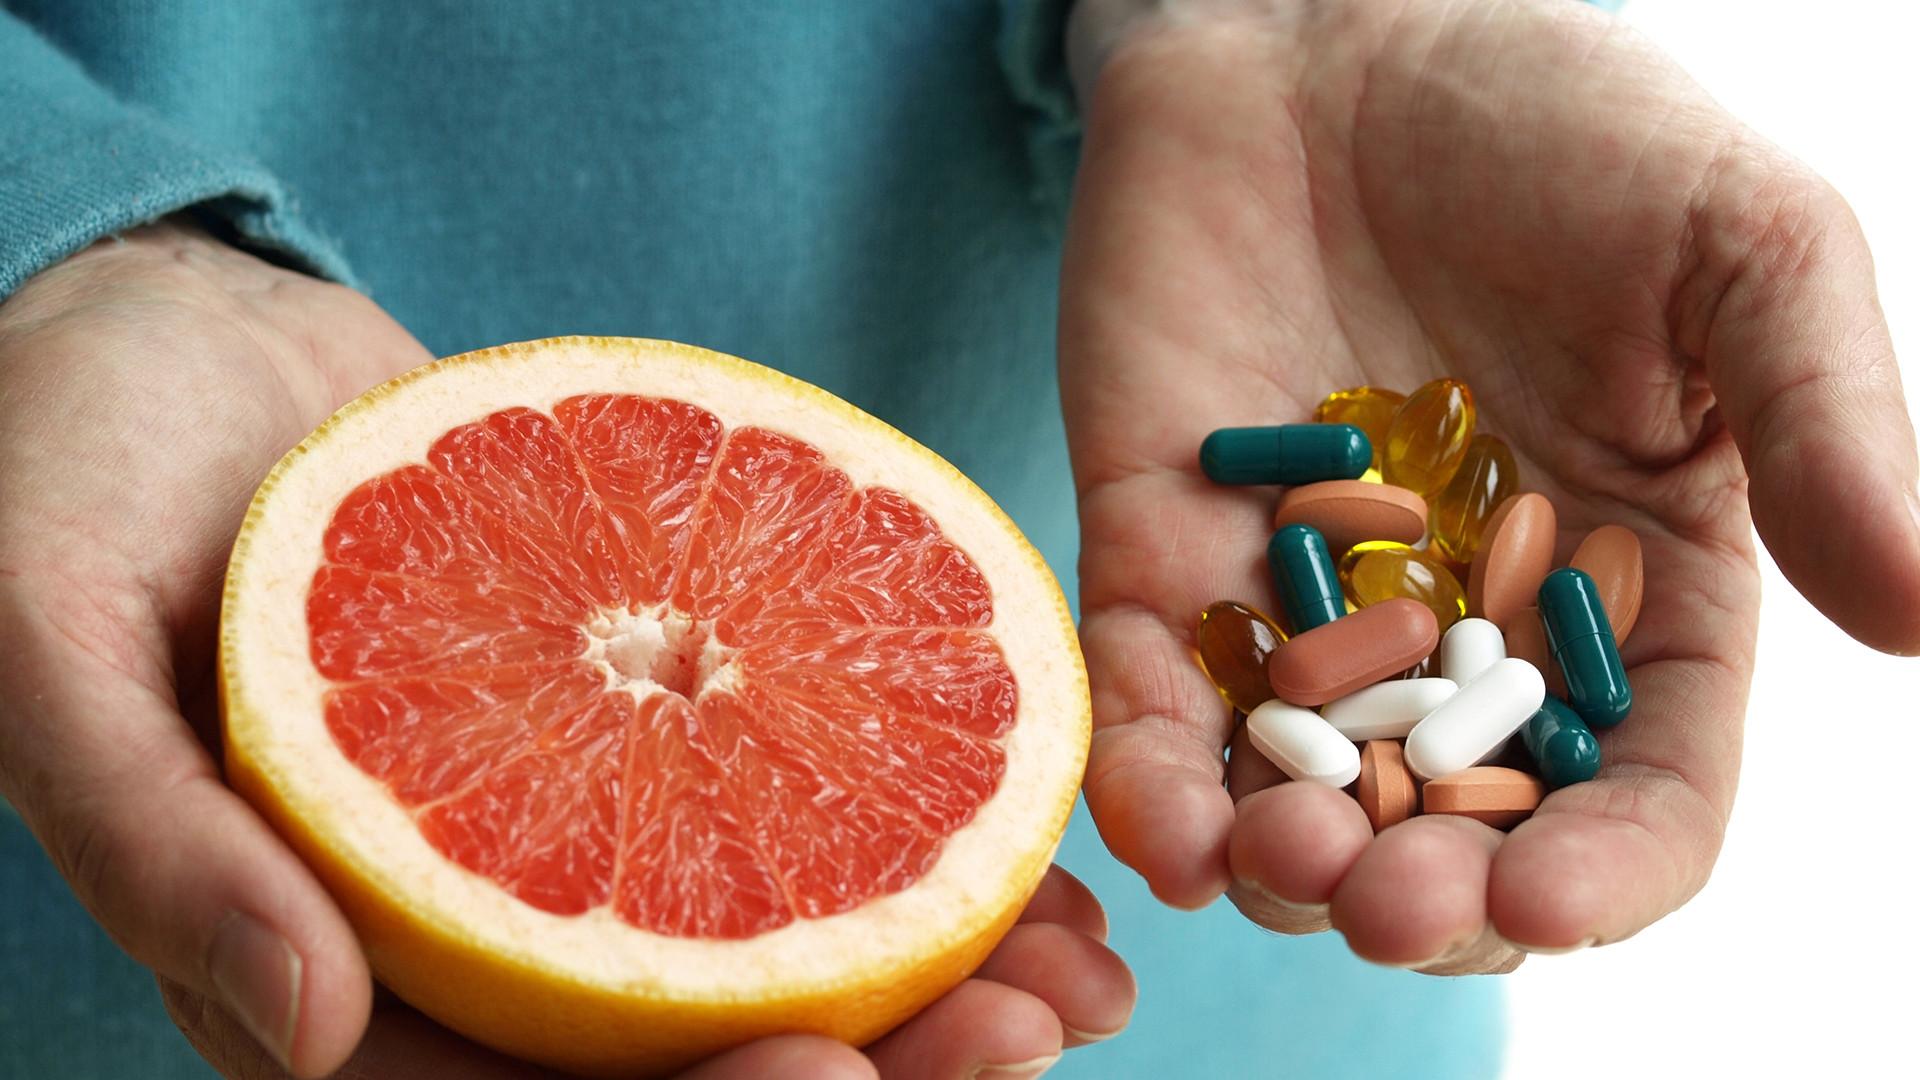 Ernährungstherapie (nach § 43 SGB V)